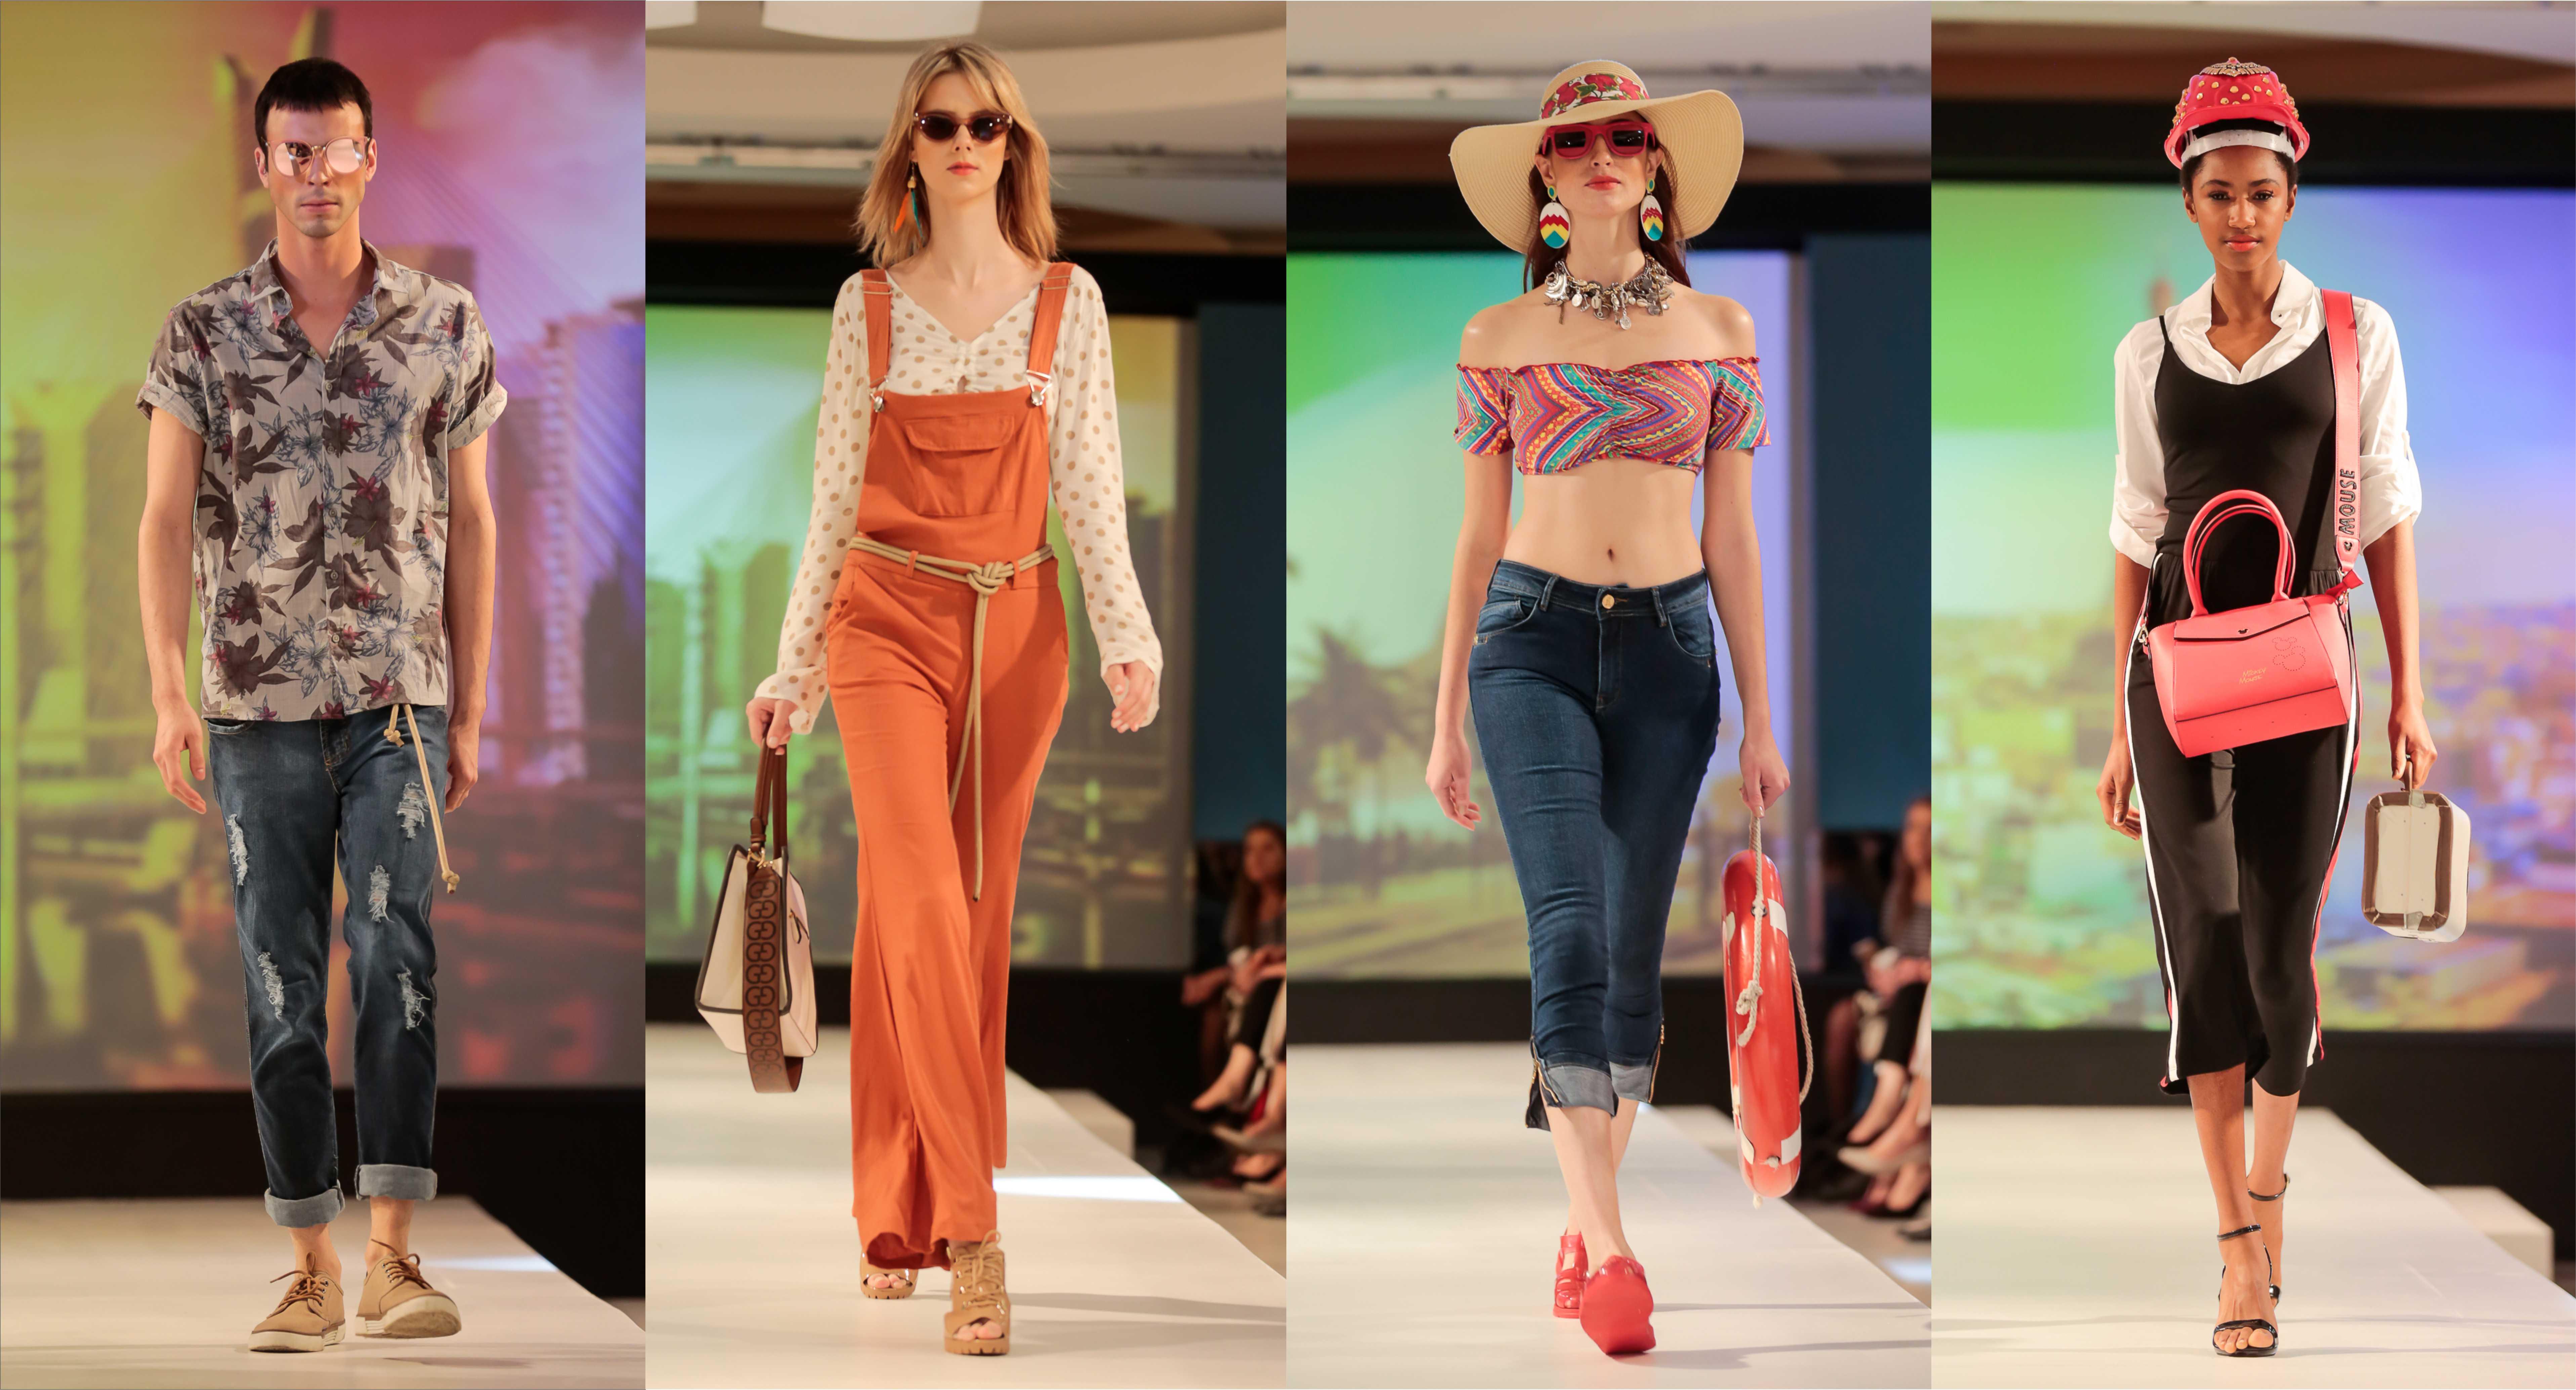 62bfa57d3 Pompéia Fashion Weekend - Blog Pompéia Fashion Club